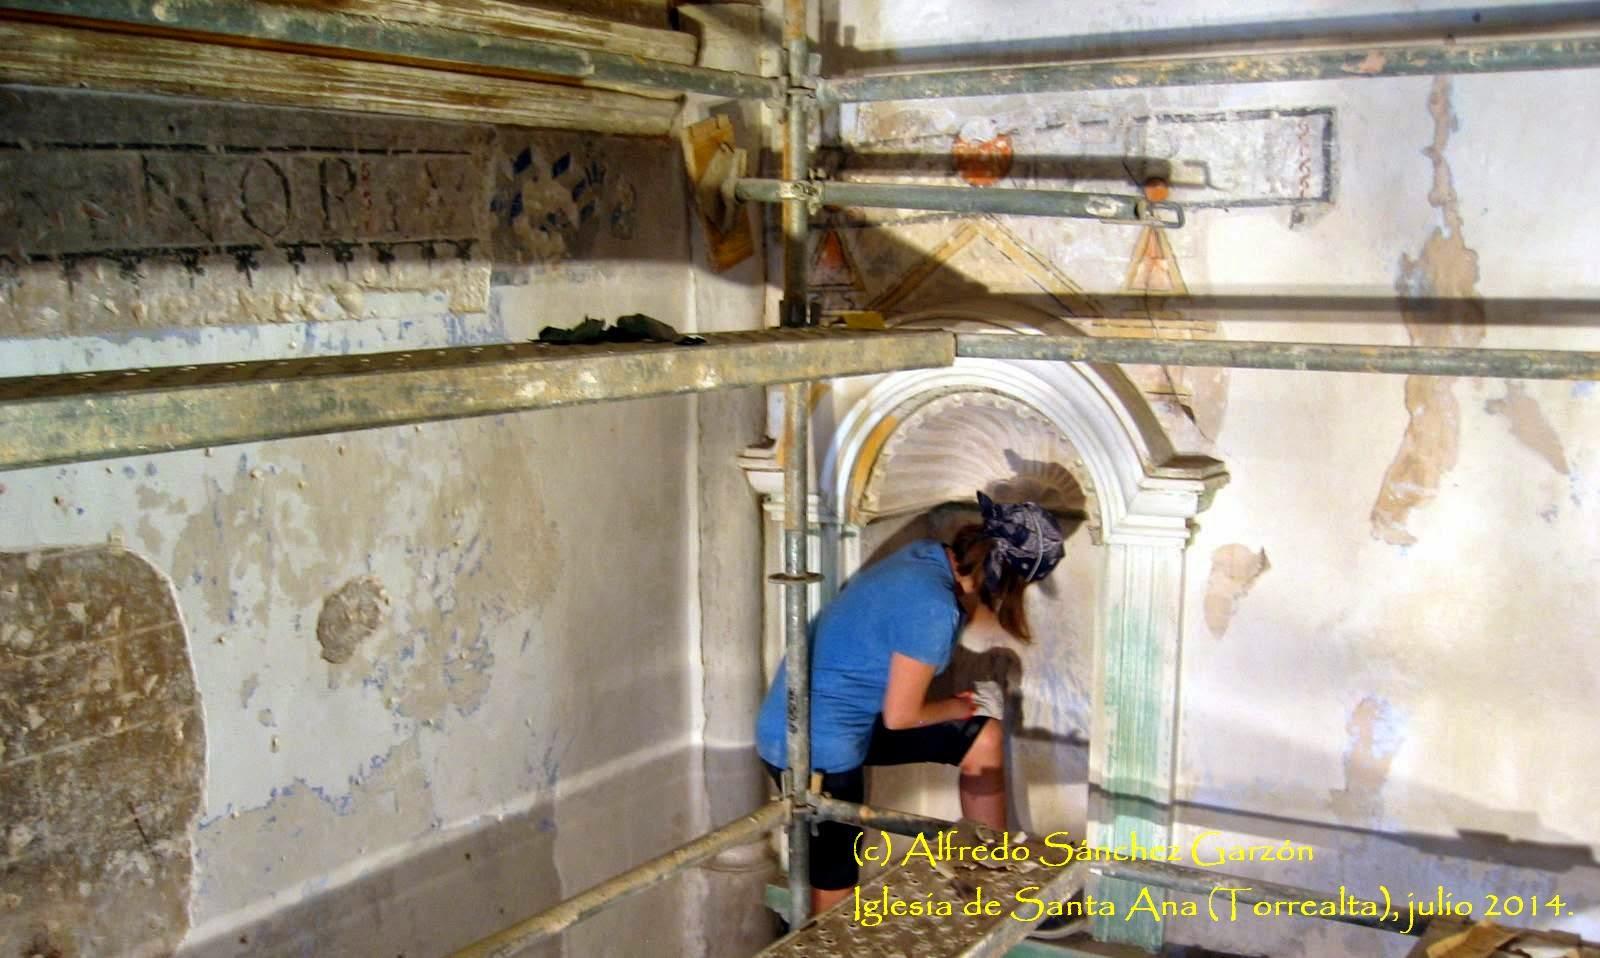 iglesia-santa-ana-torrealta-trabajos-restauracion